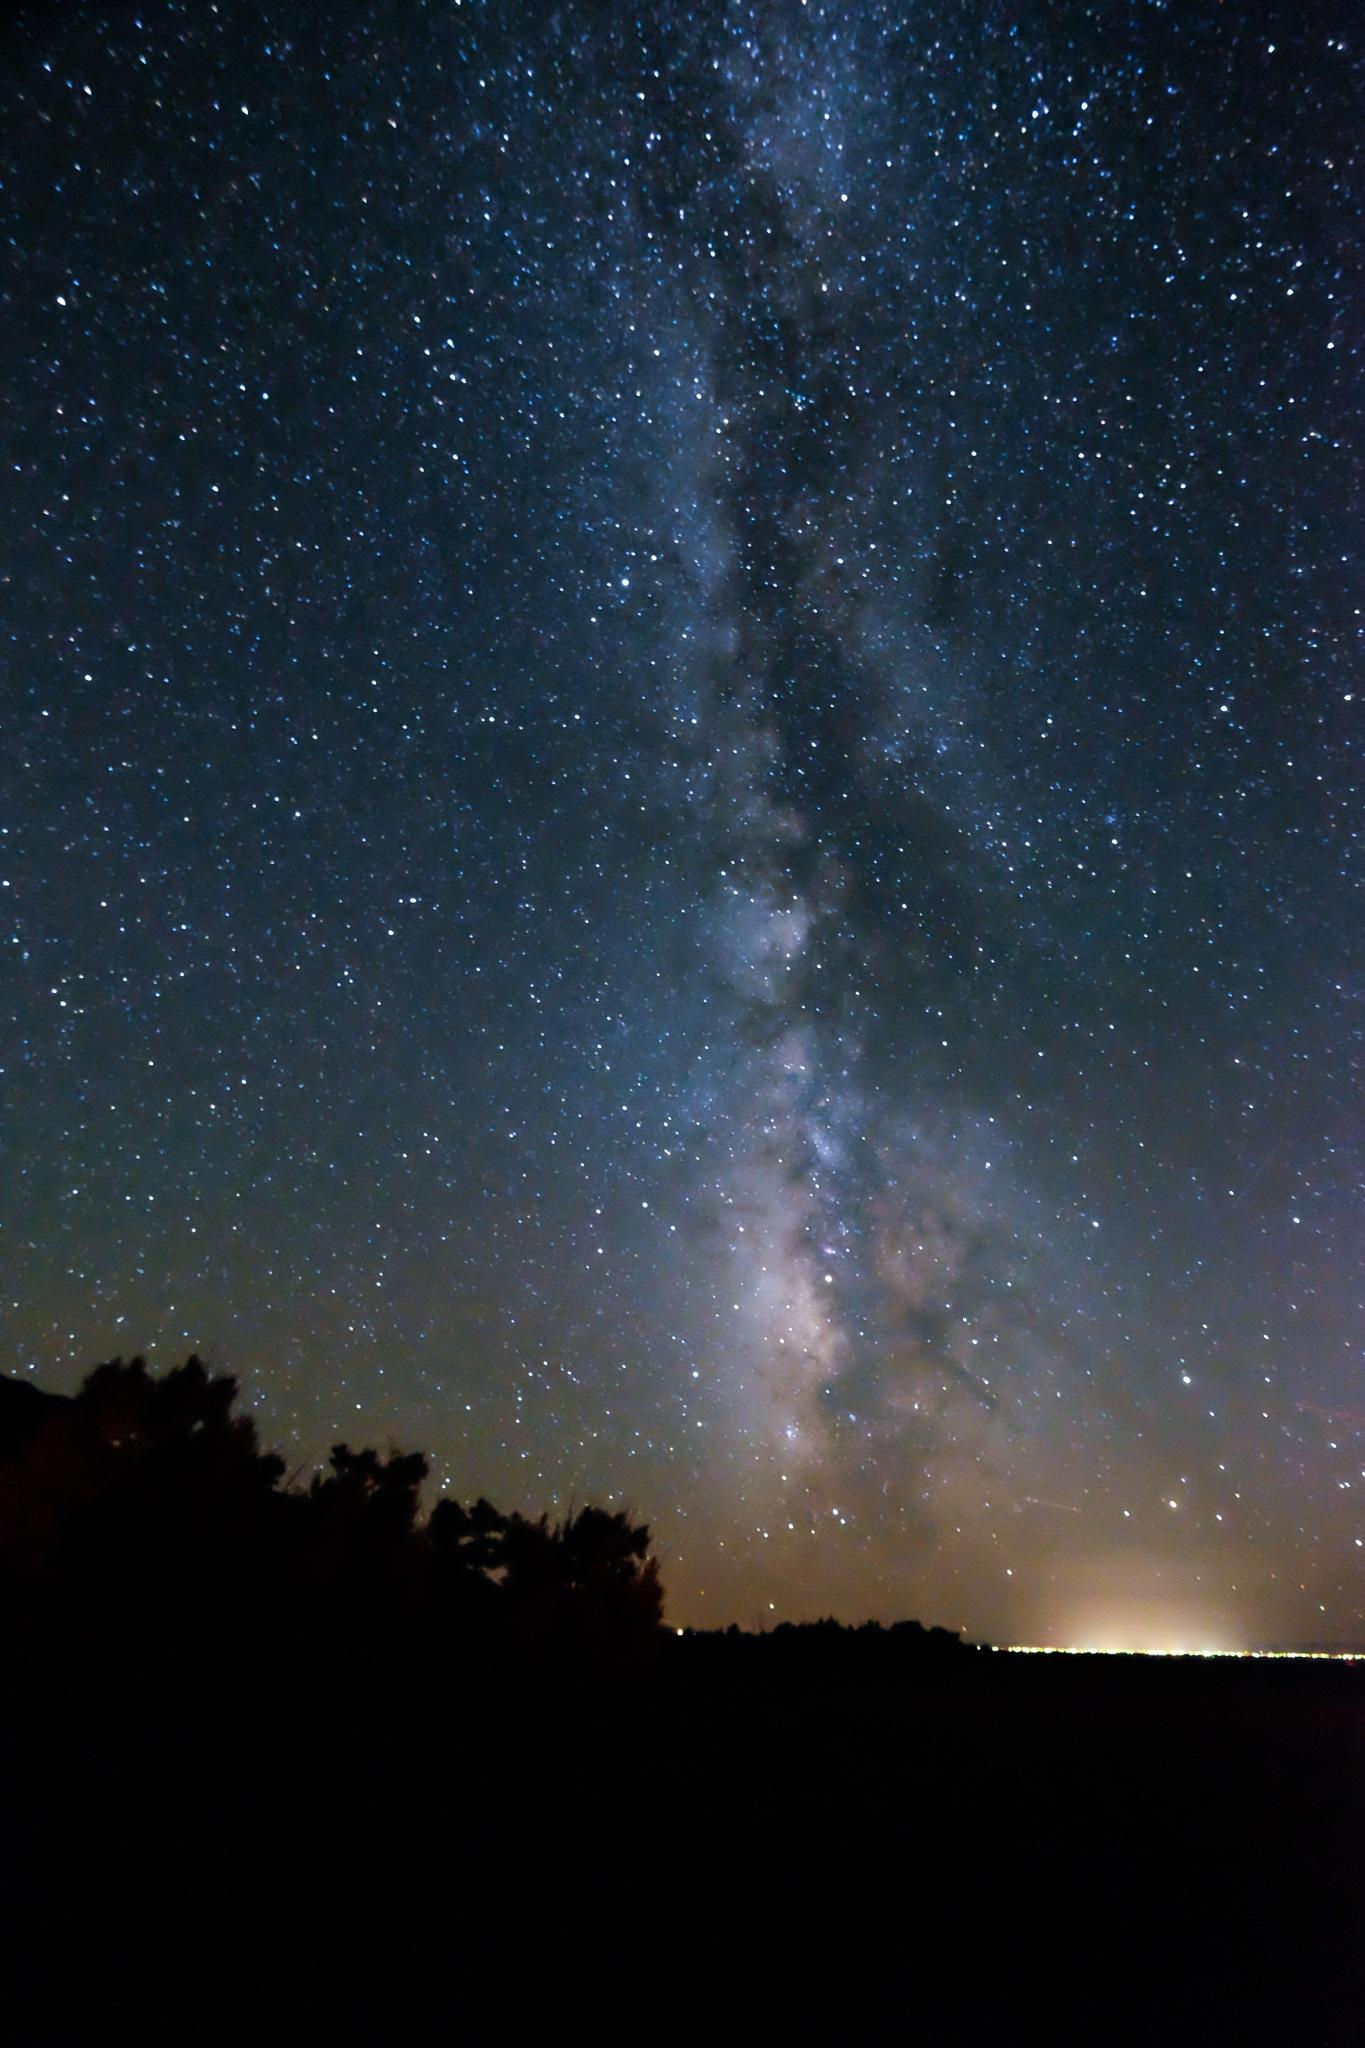 Milky Way by George Neill